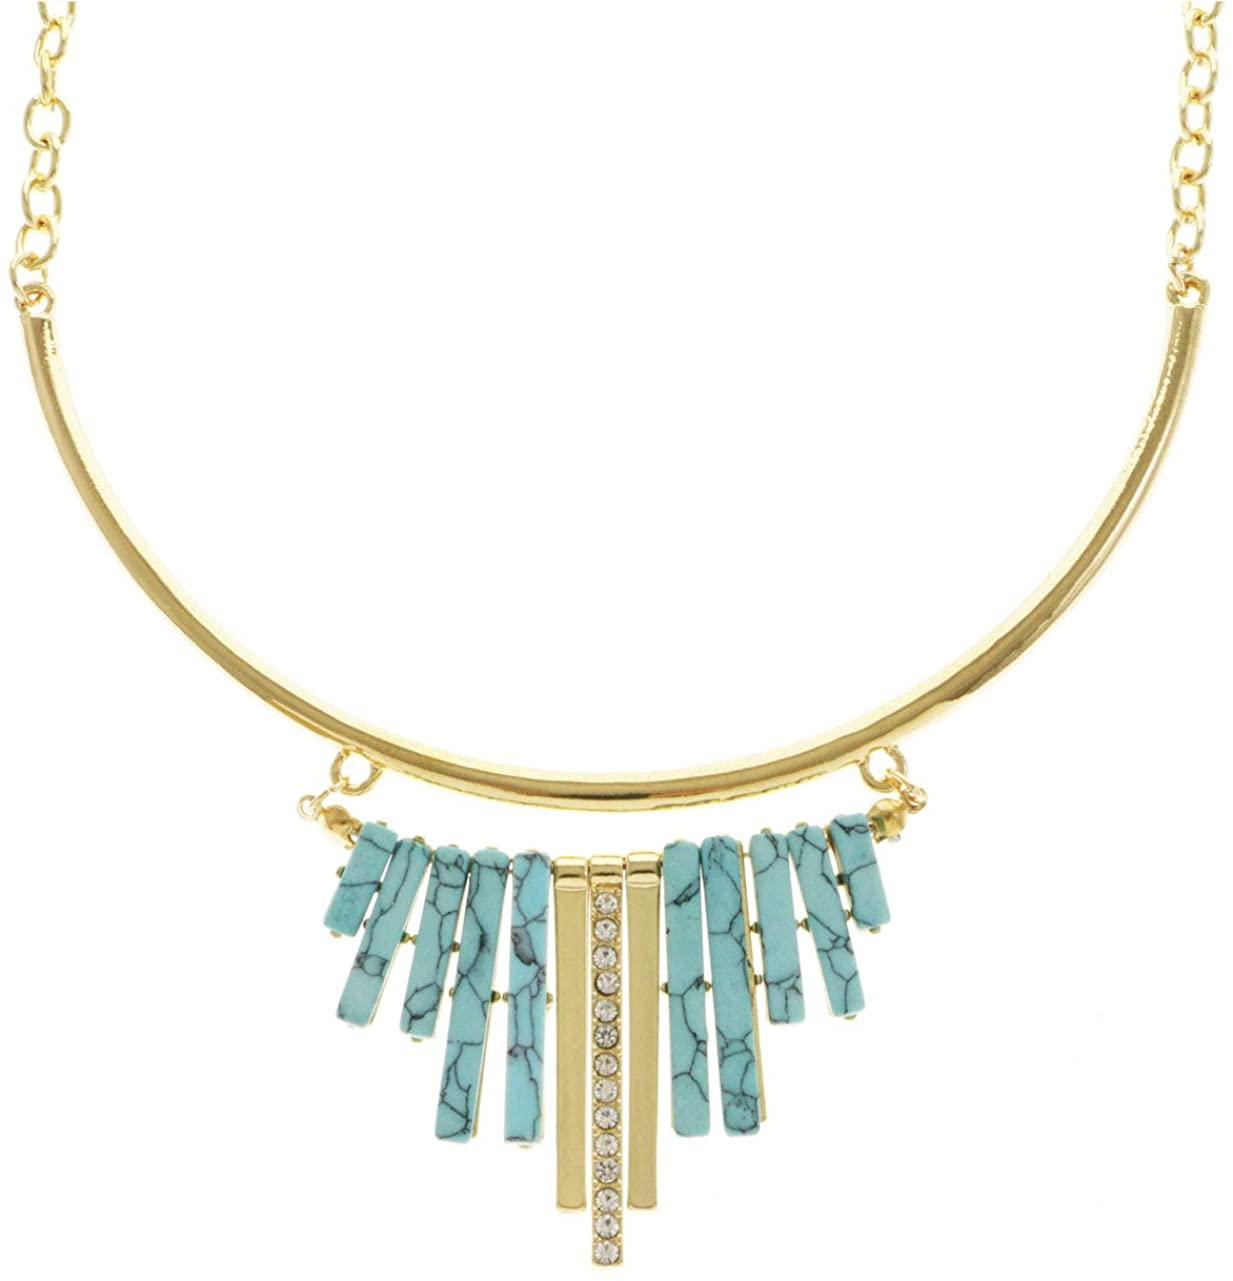 Erica Lyons Velvet Gift Bag Turquoise Crystal Collar-Necklace Gold-Tone & Blue